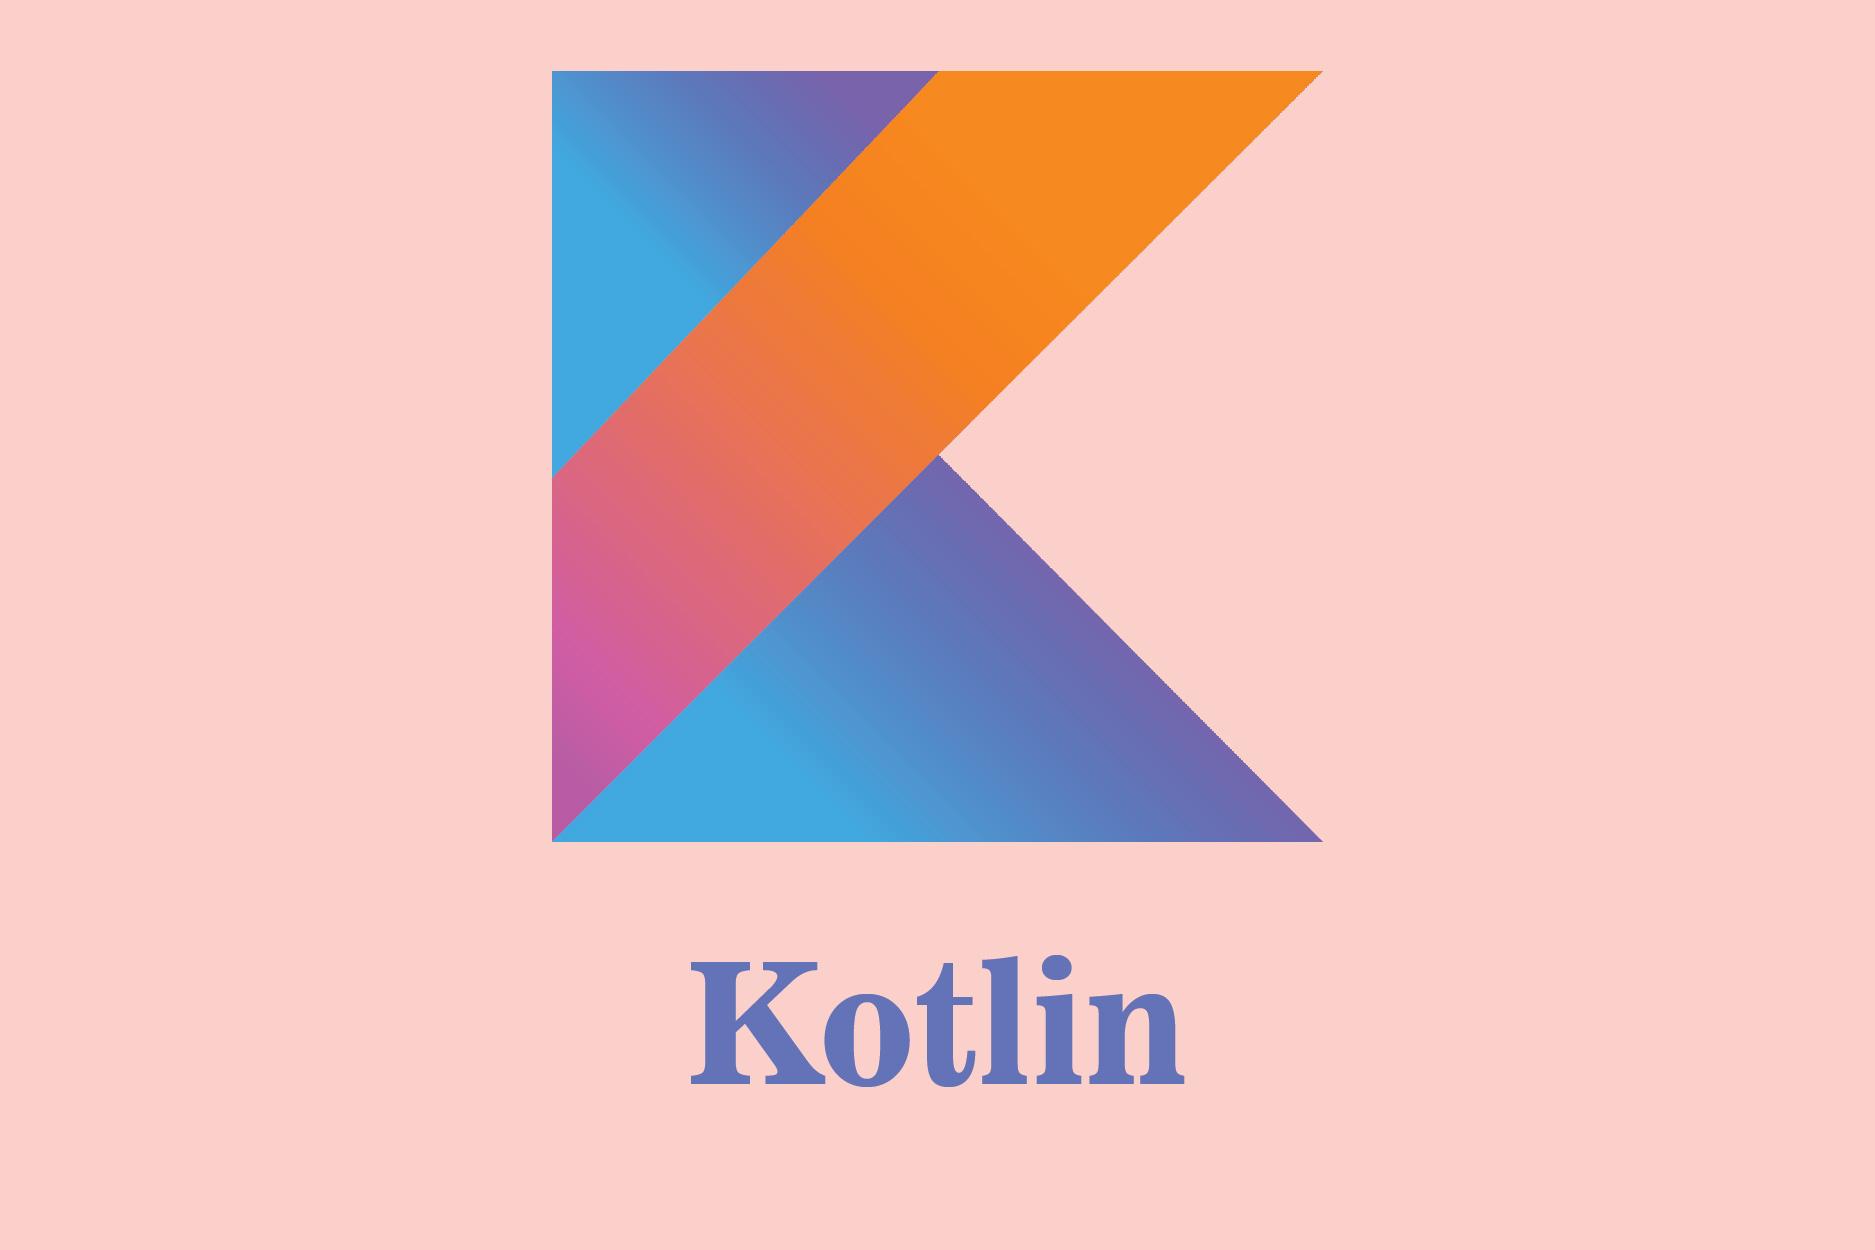 kotlin, popular programing language, most popular programming language of 2021, learn kotlin